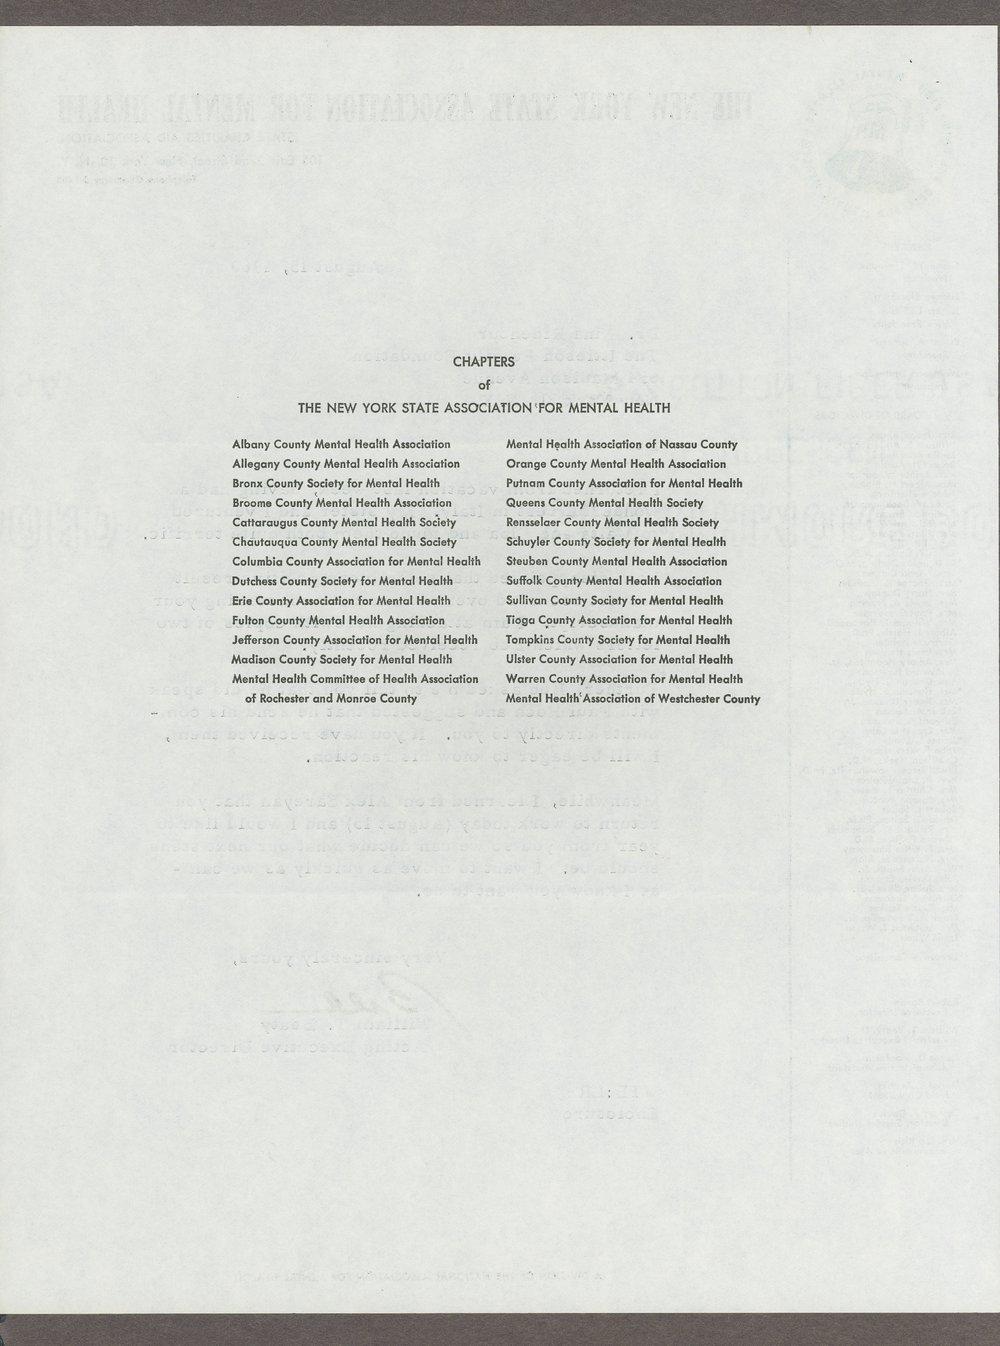 Nina Ridenour papers - 10